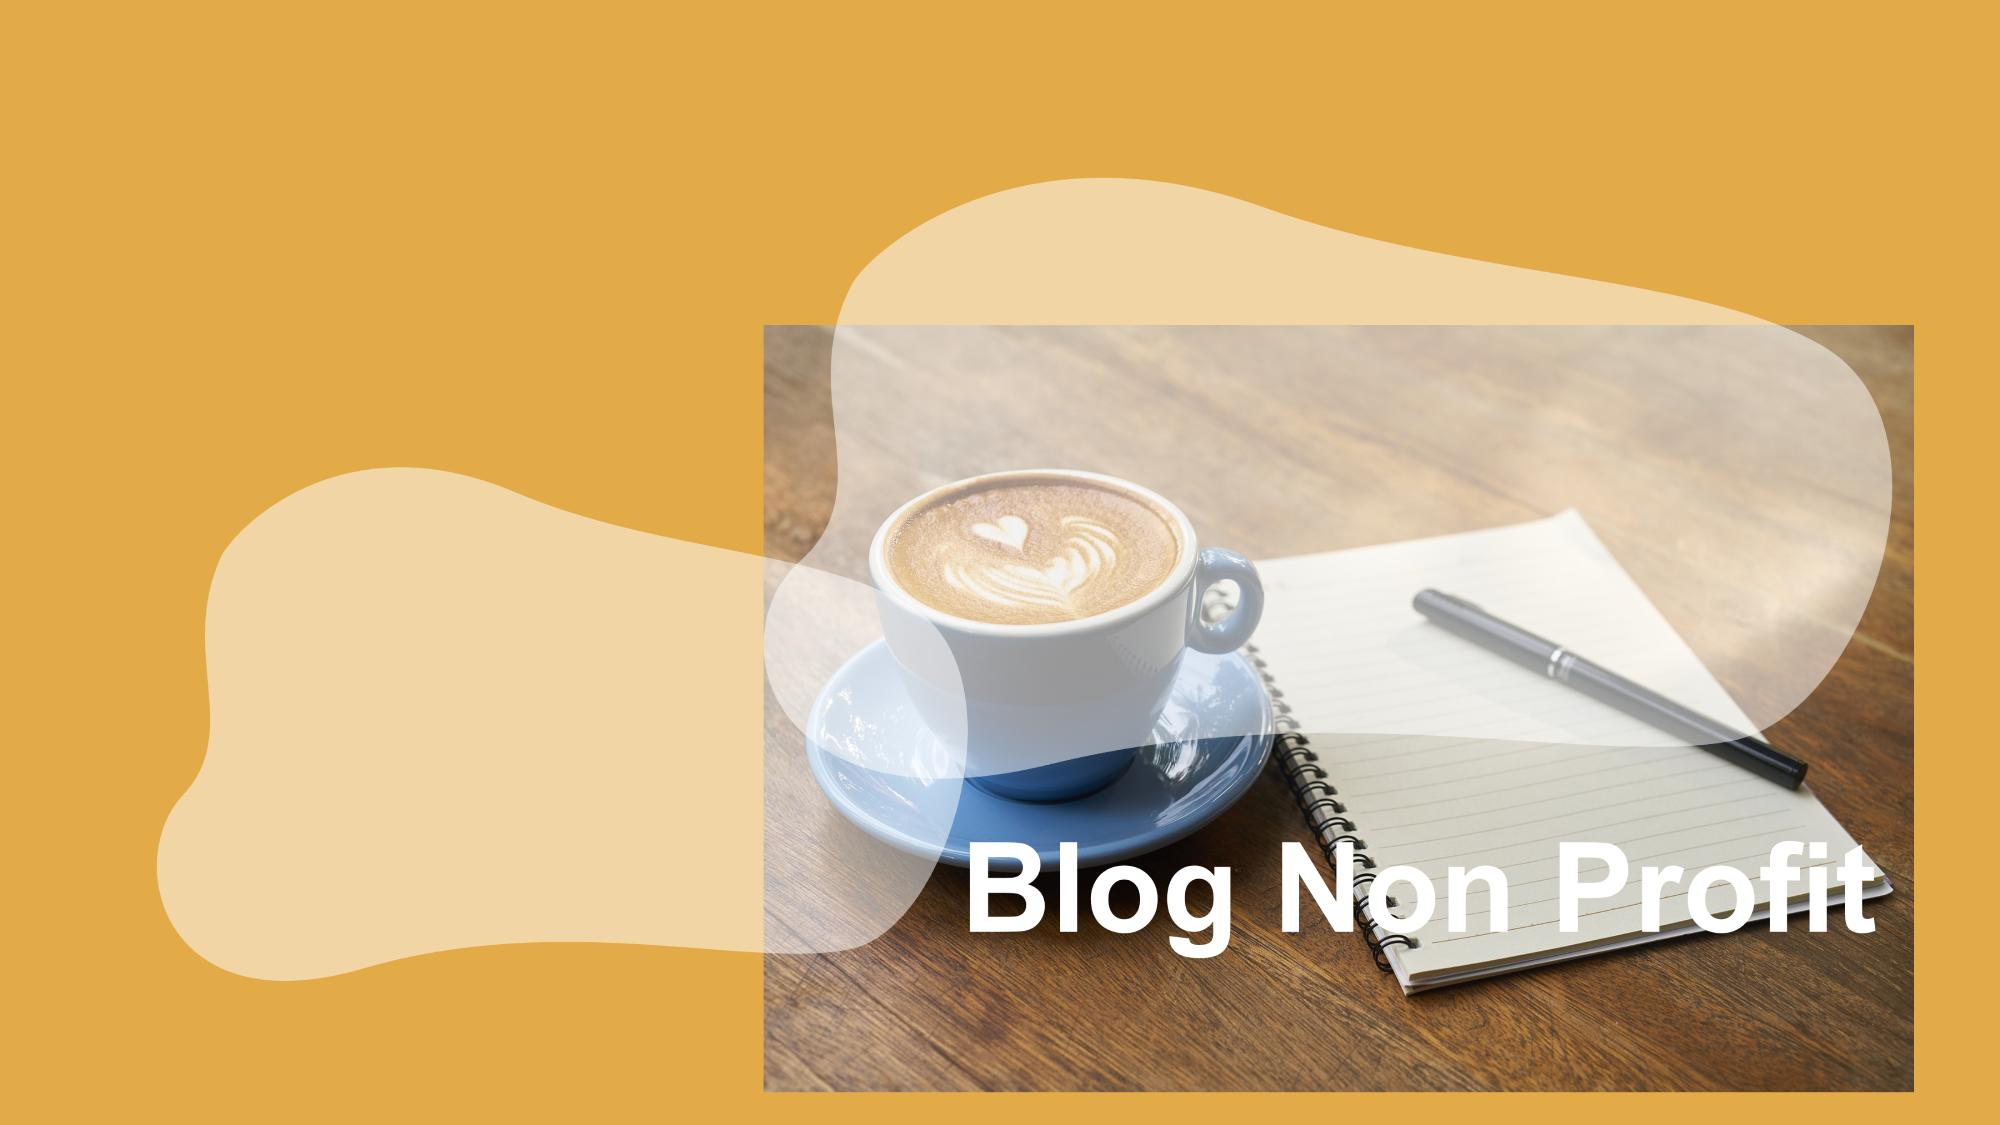 Blog Non Profit